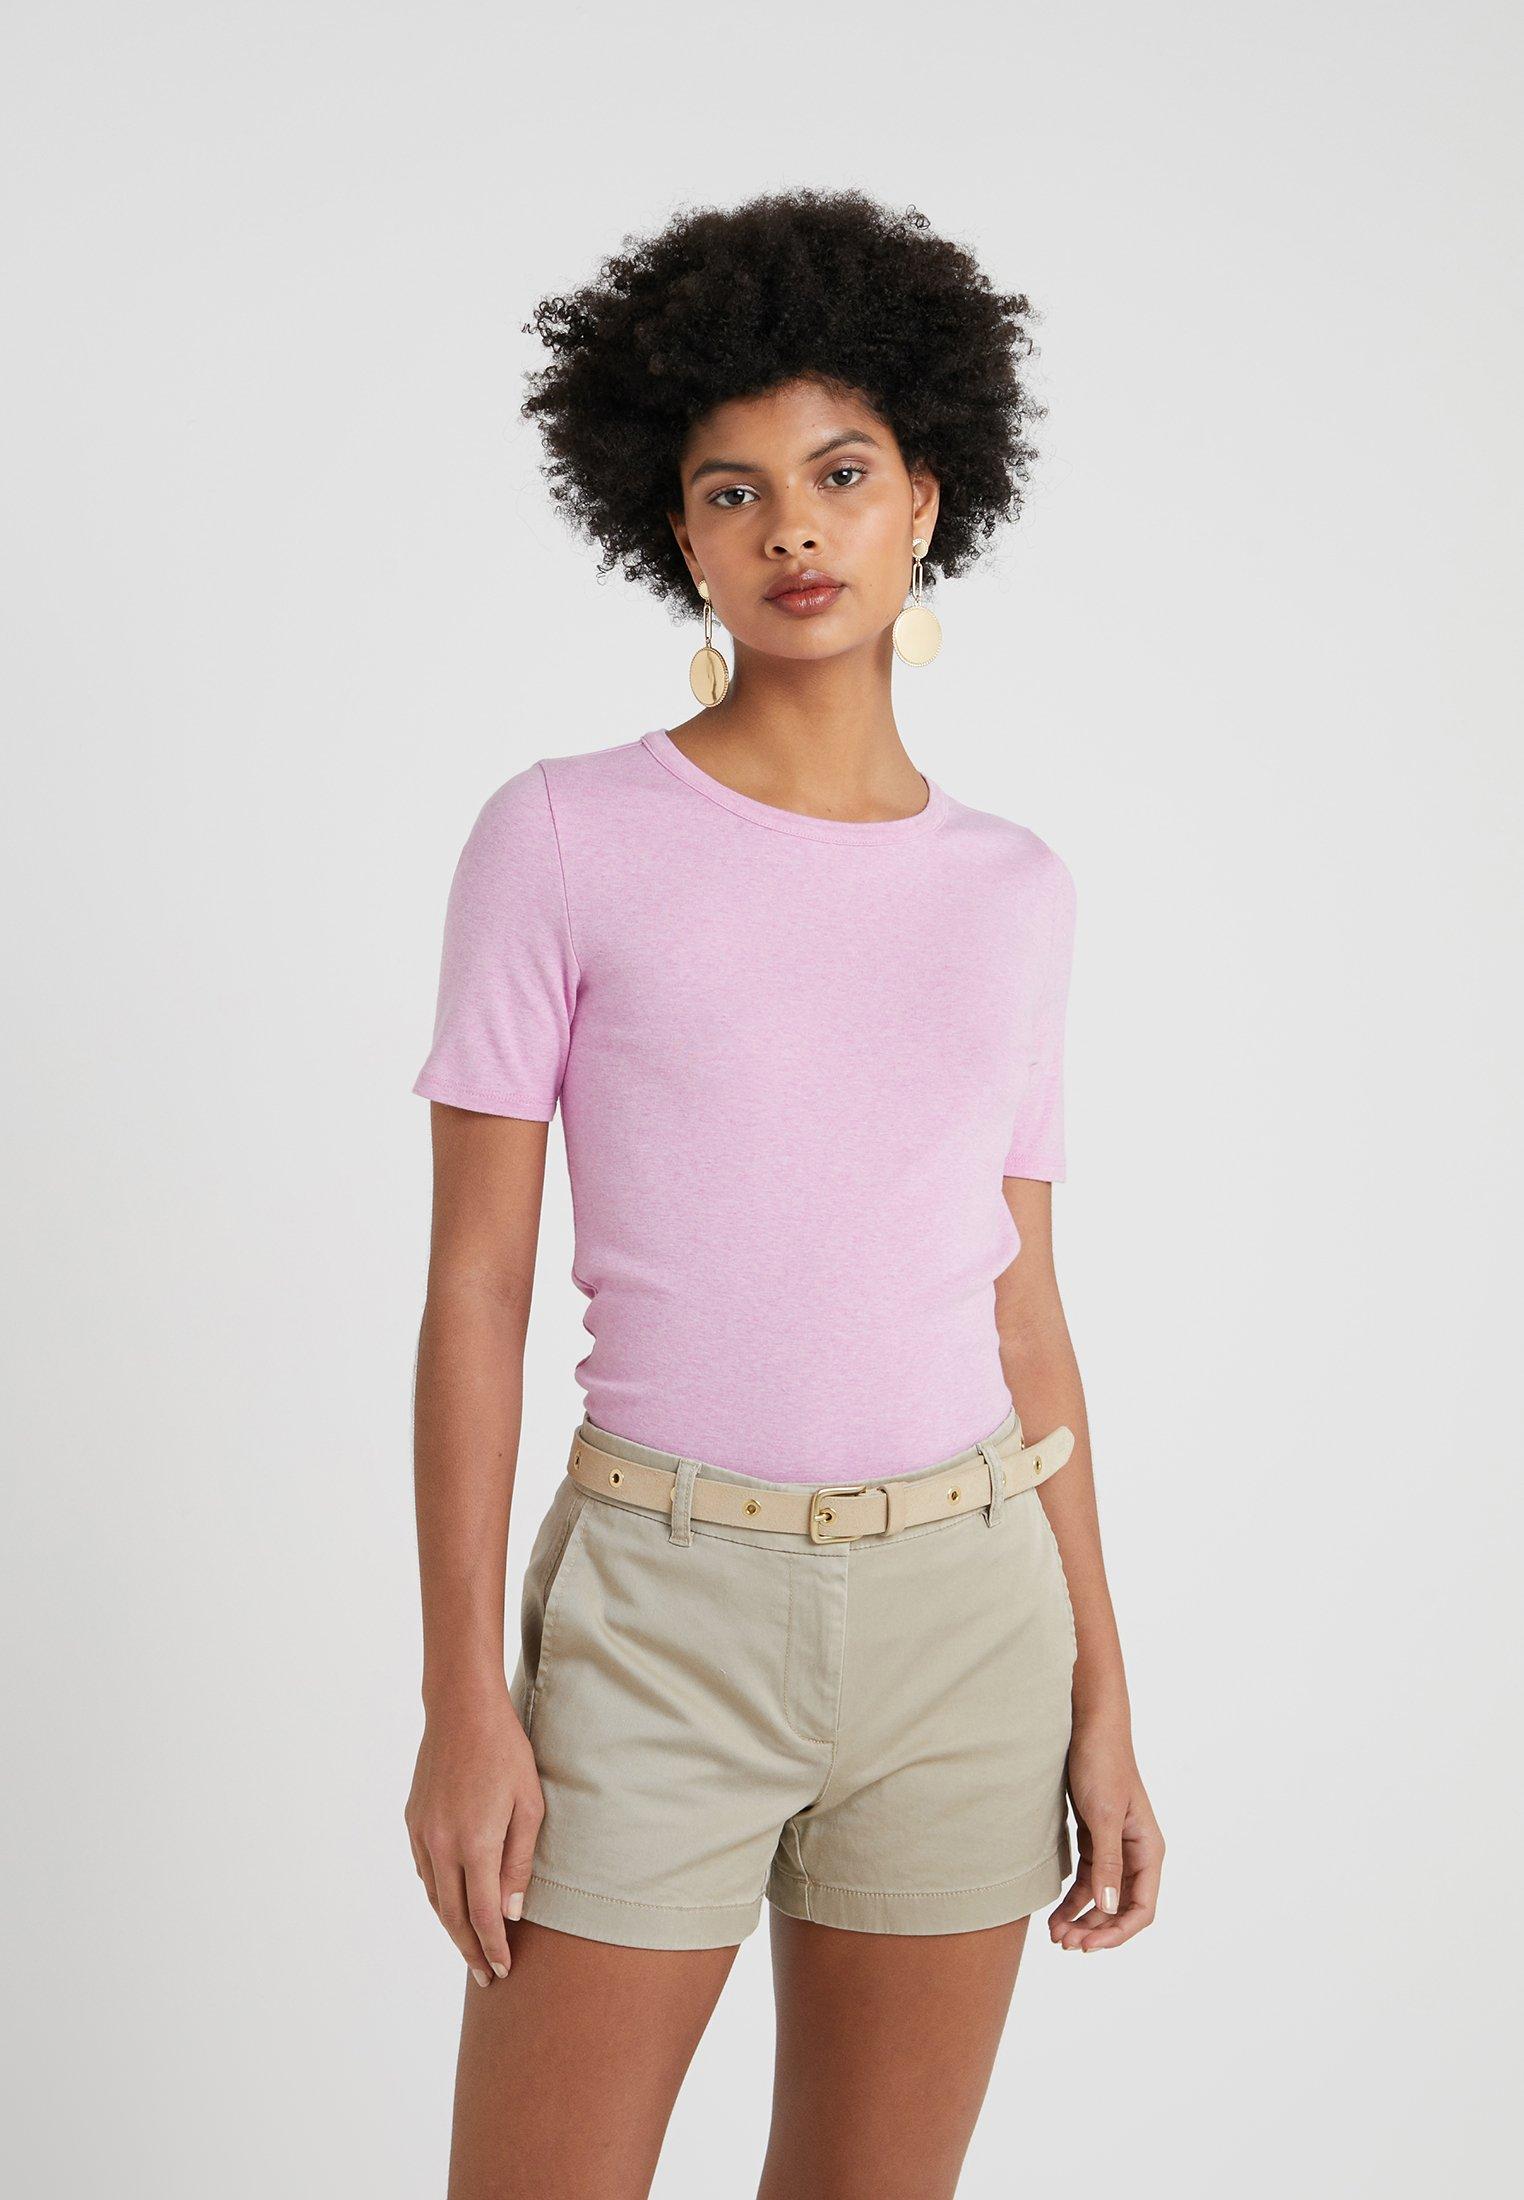 Elbow TeeT shirt Slim Basique Heather Wisteria Sleeve crew Pefect Smoky J FTJlK1c